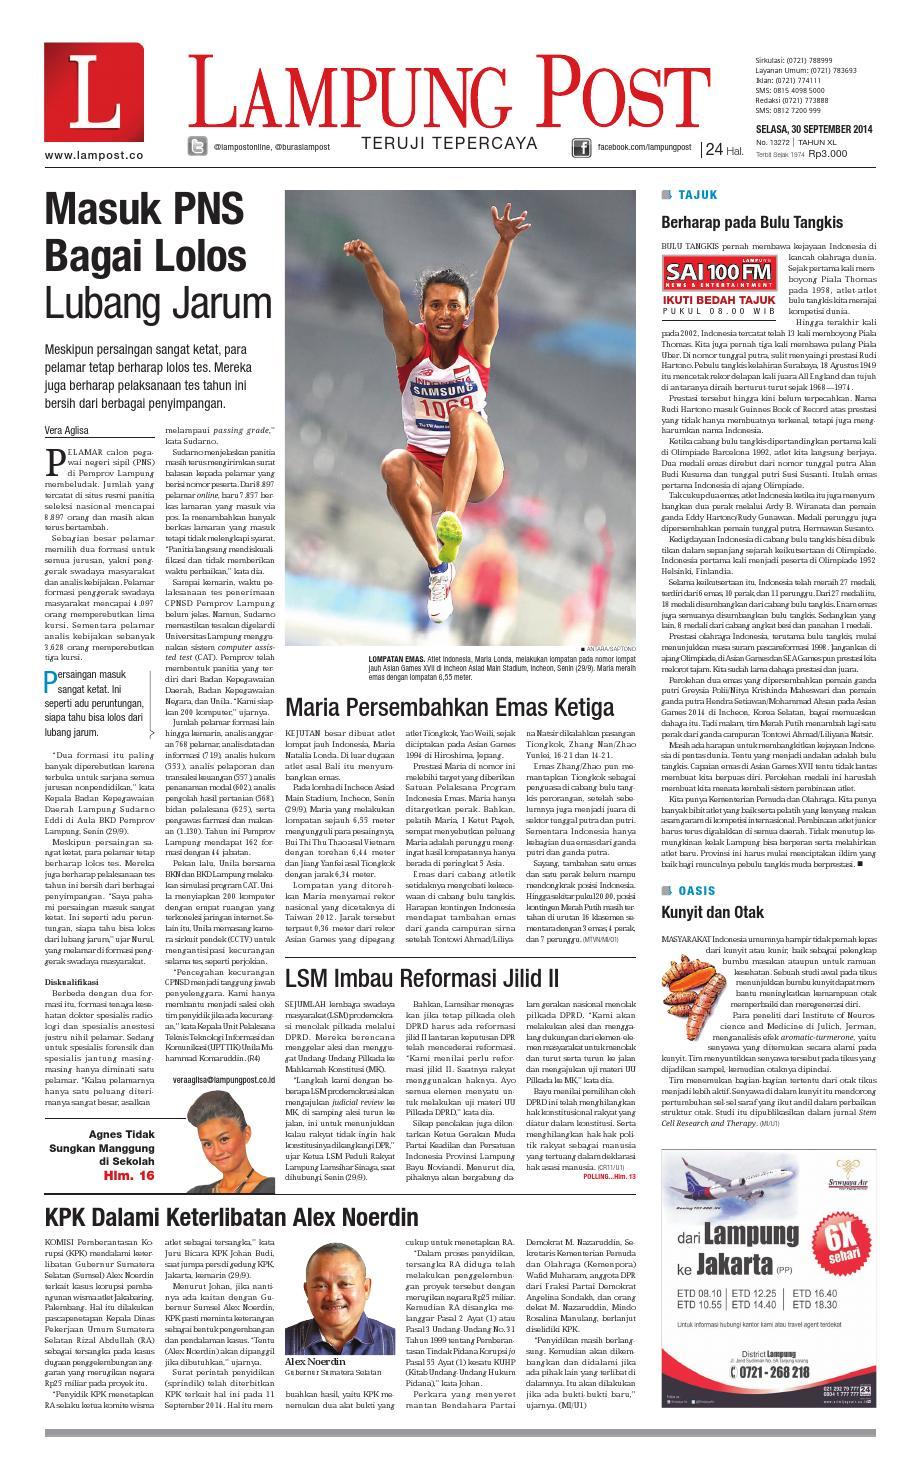 Lampung Post Selasa 30 September 2014 By Issuu Produk Ukm Bumn Jamu Kunyit Asam Seger Waras